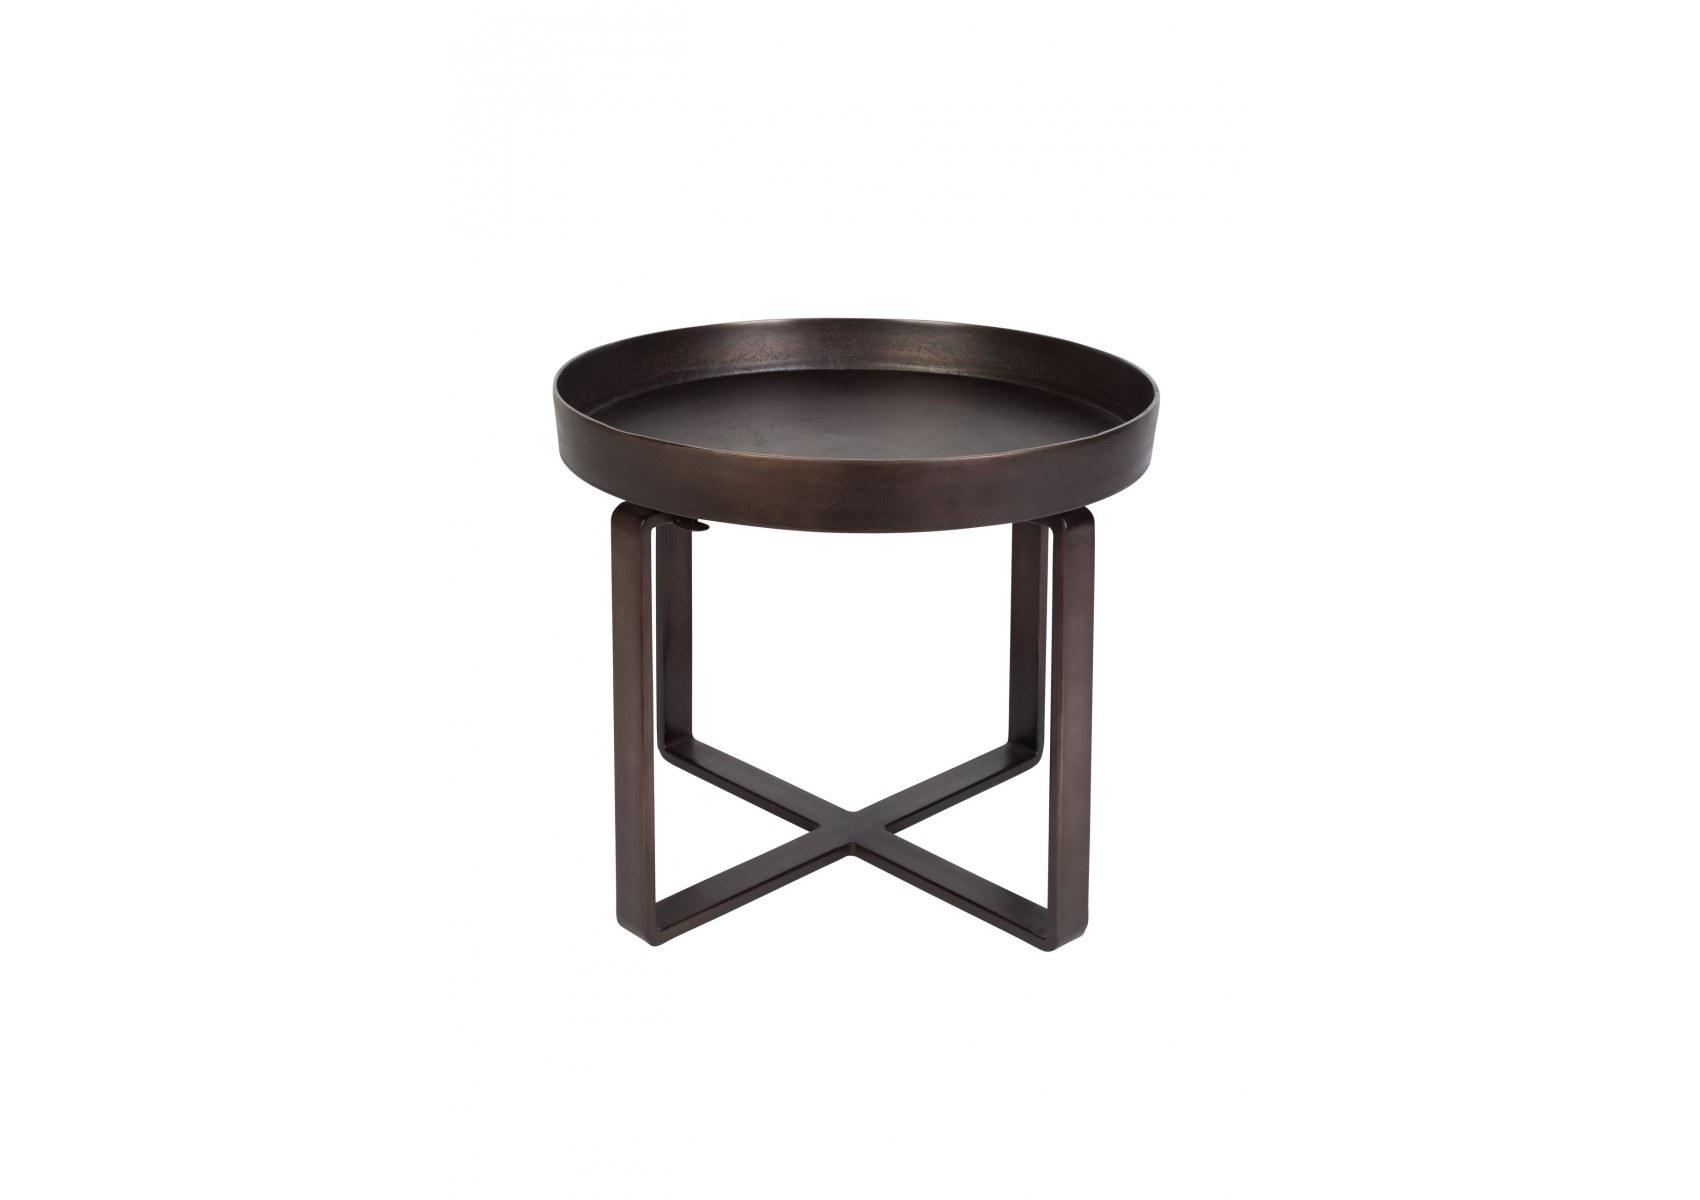 En Table Basse Ferro Dutchbone Fer qMpSVzU